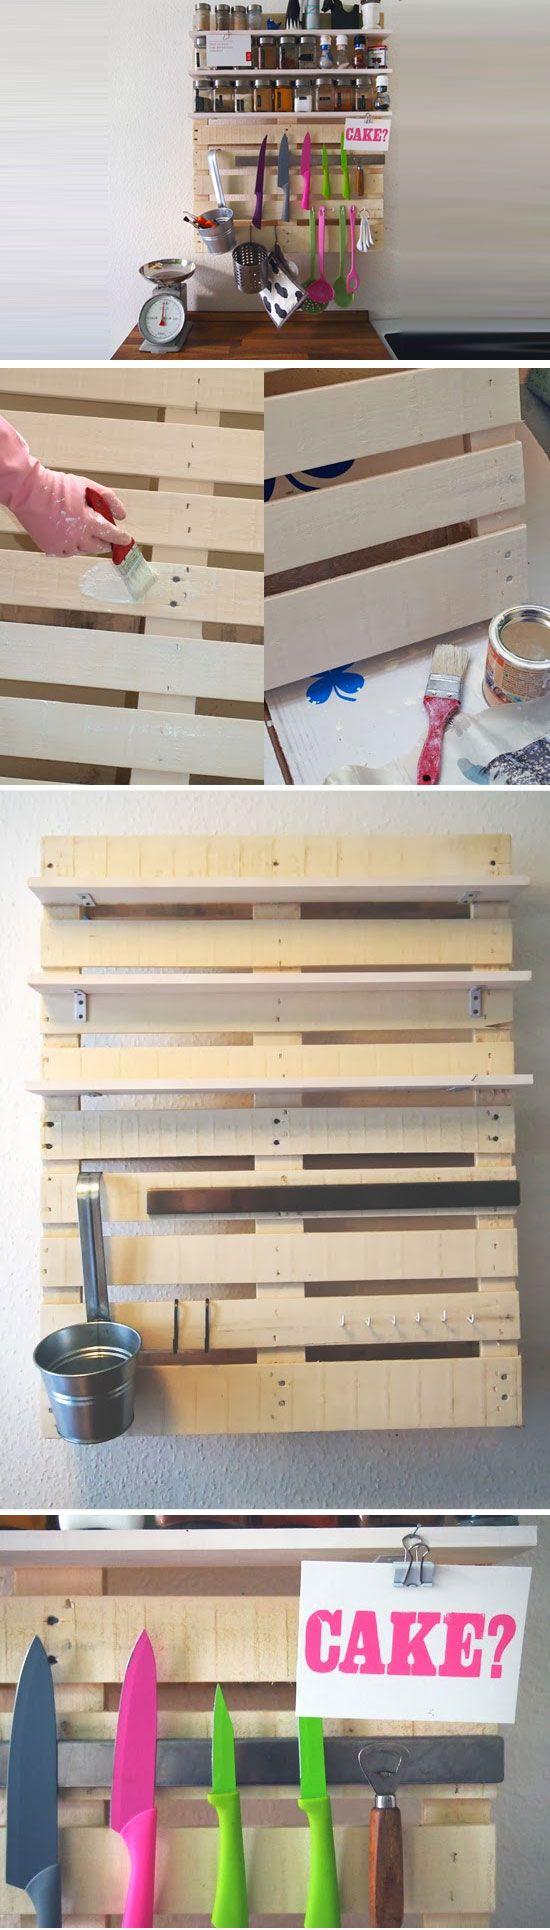 Pallet Shelf | Click Pick for 23 DIY Kitchen Organization Ideas | DIY Kitchen Storage Ideas for Small Kitchens